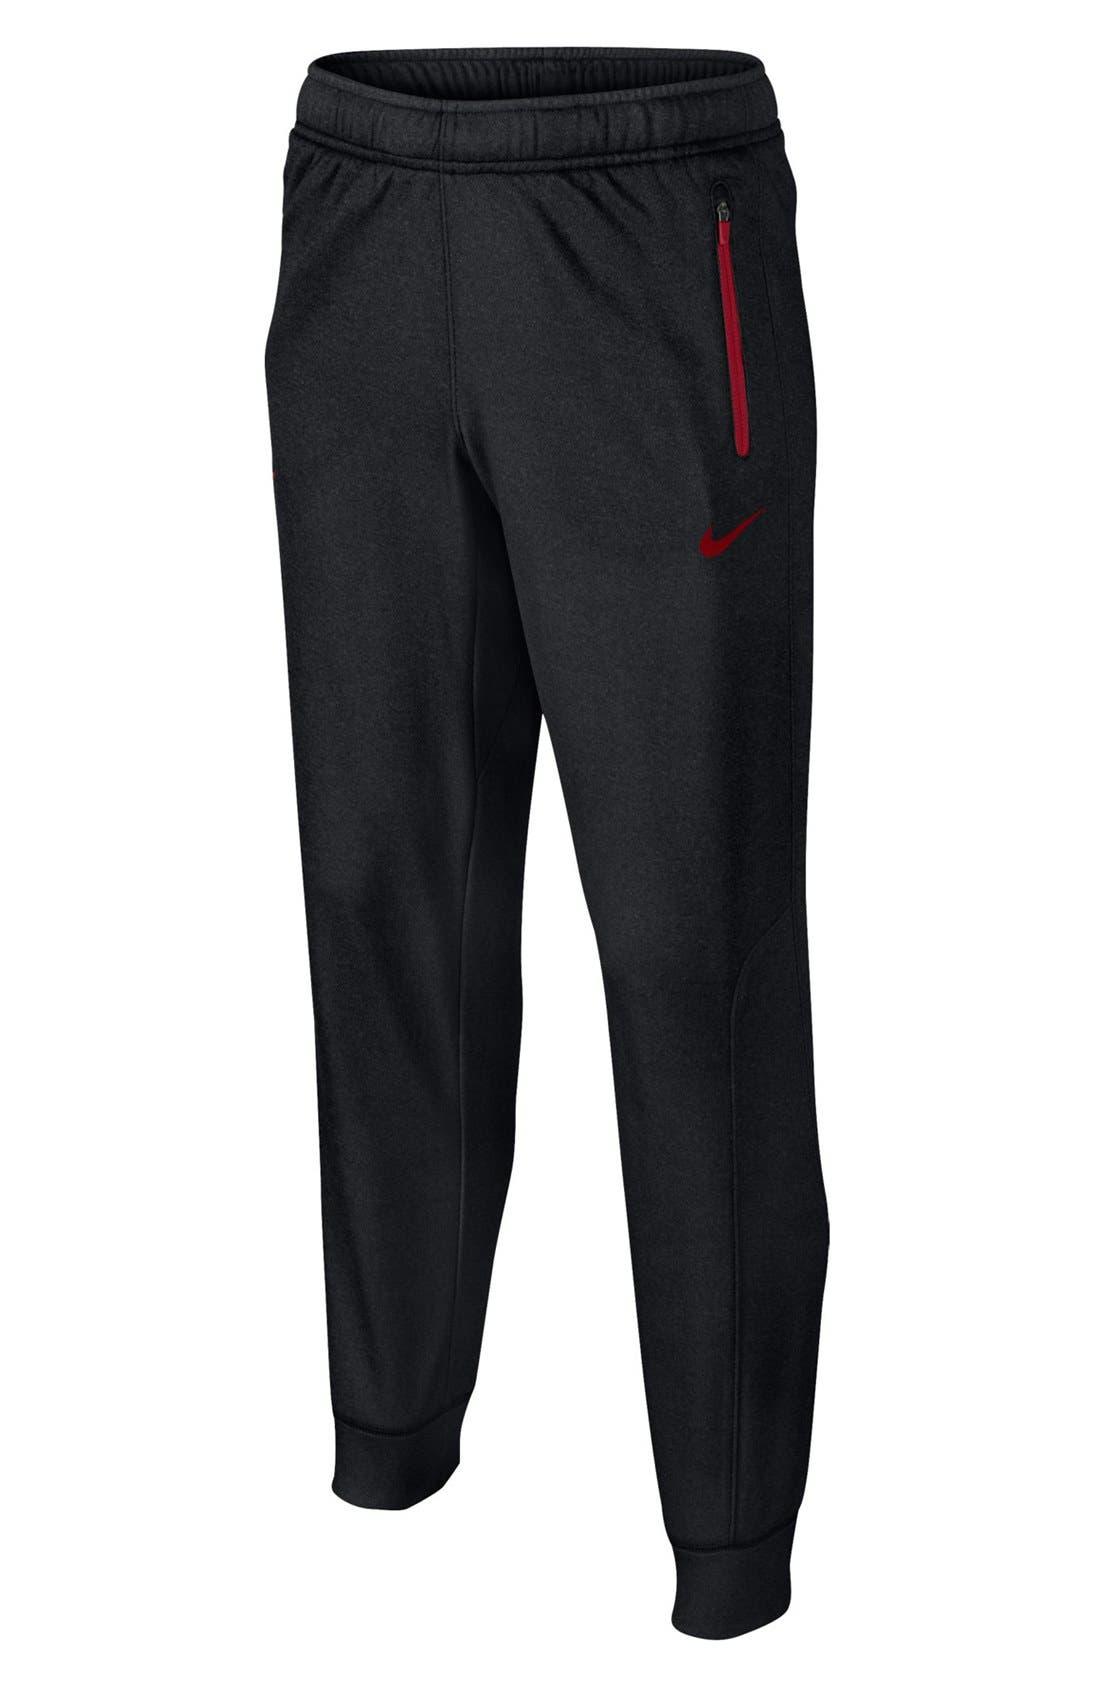 Main Image - Nike 'LeBron Performance Hero' Dri-FIT Pants (Big Boys)